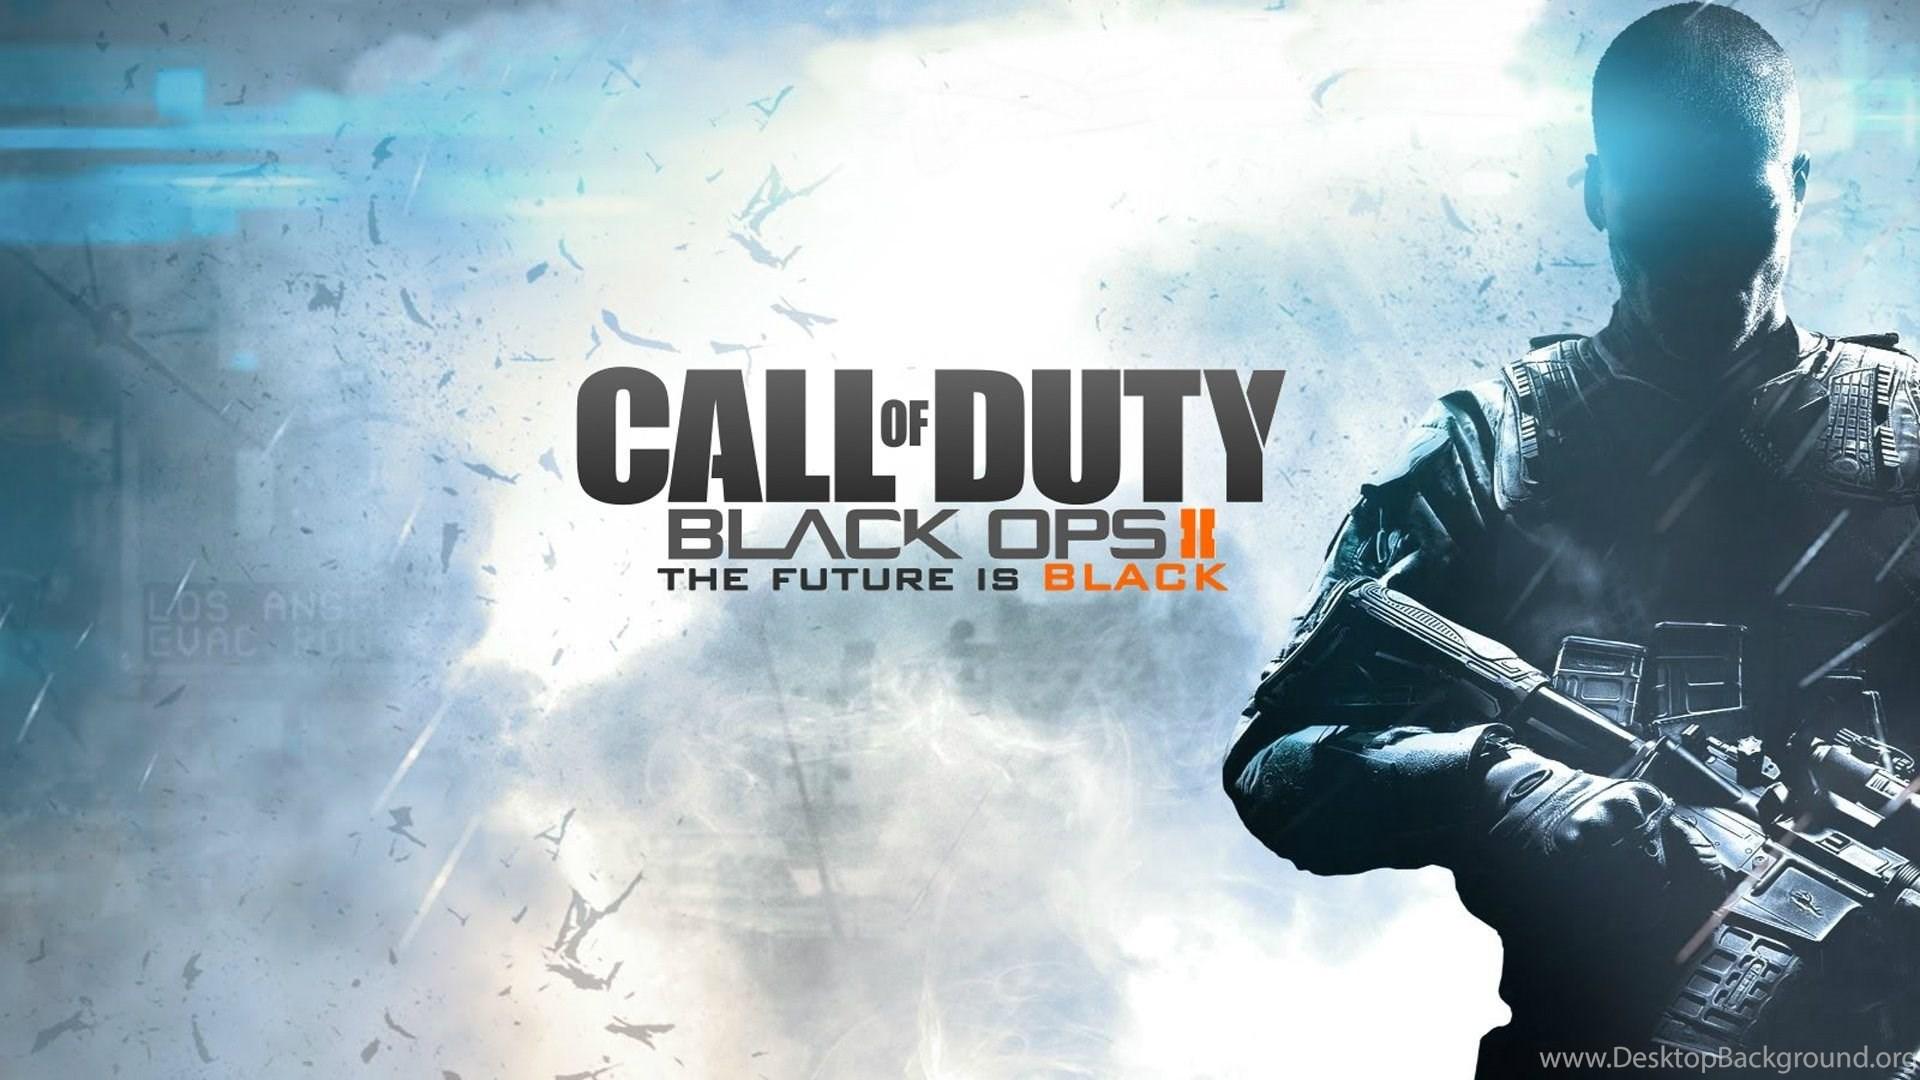 Full Hd Wallpapers Call Of Duty Black Ops 2 Mercenary Figure